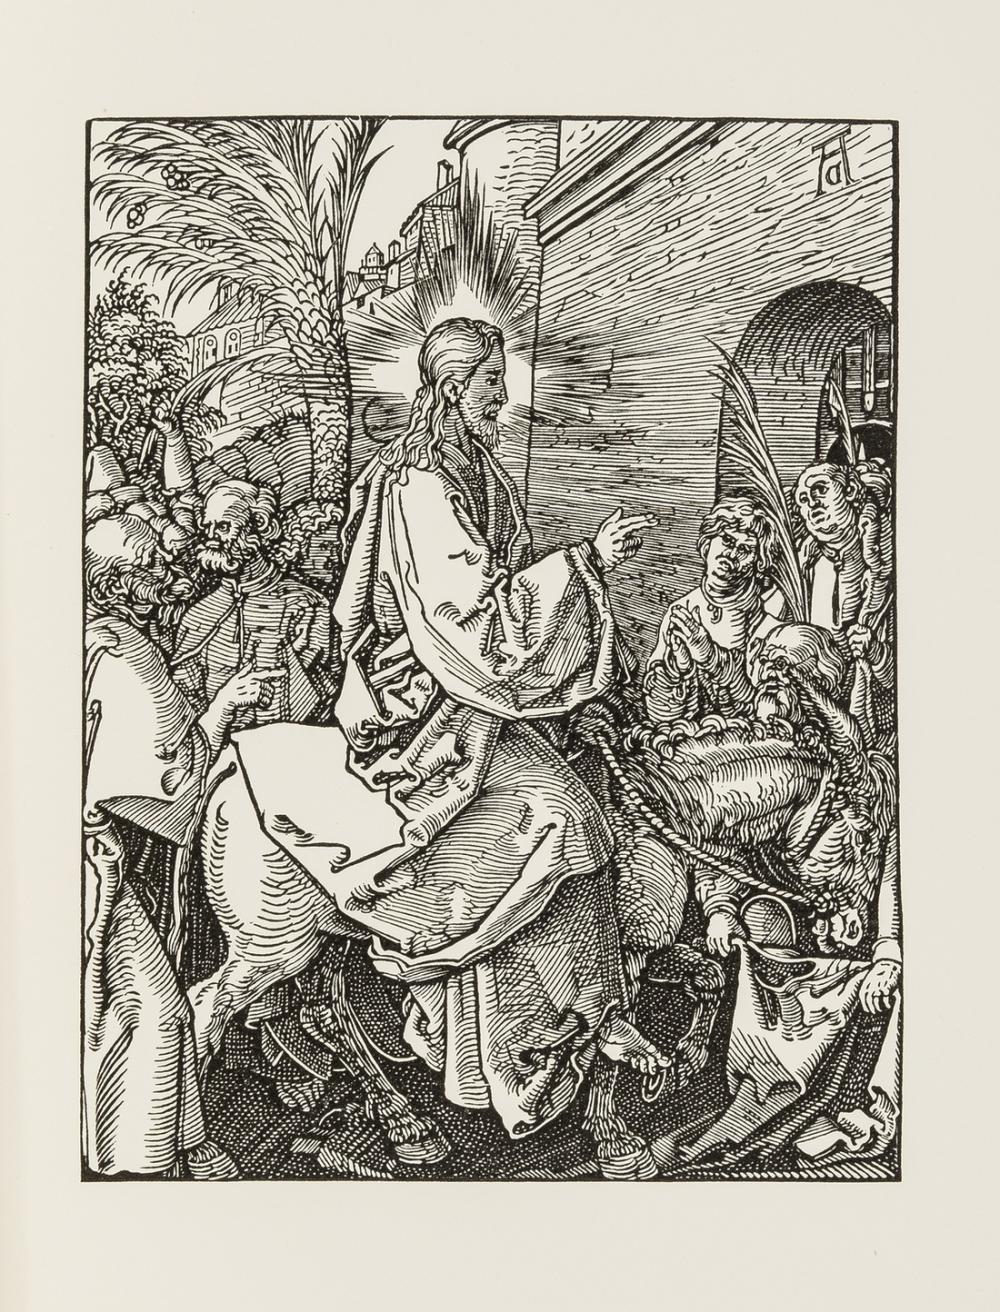 Officina Bodoni.- Dürer (Albrecht) The Little Passion, one of 140 copies, Verona, 1971.